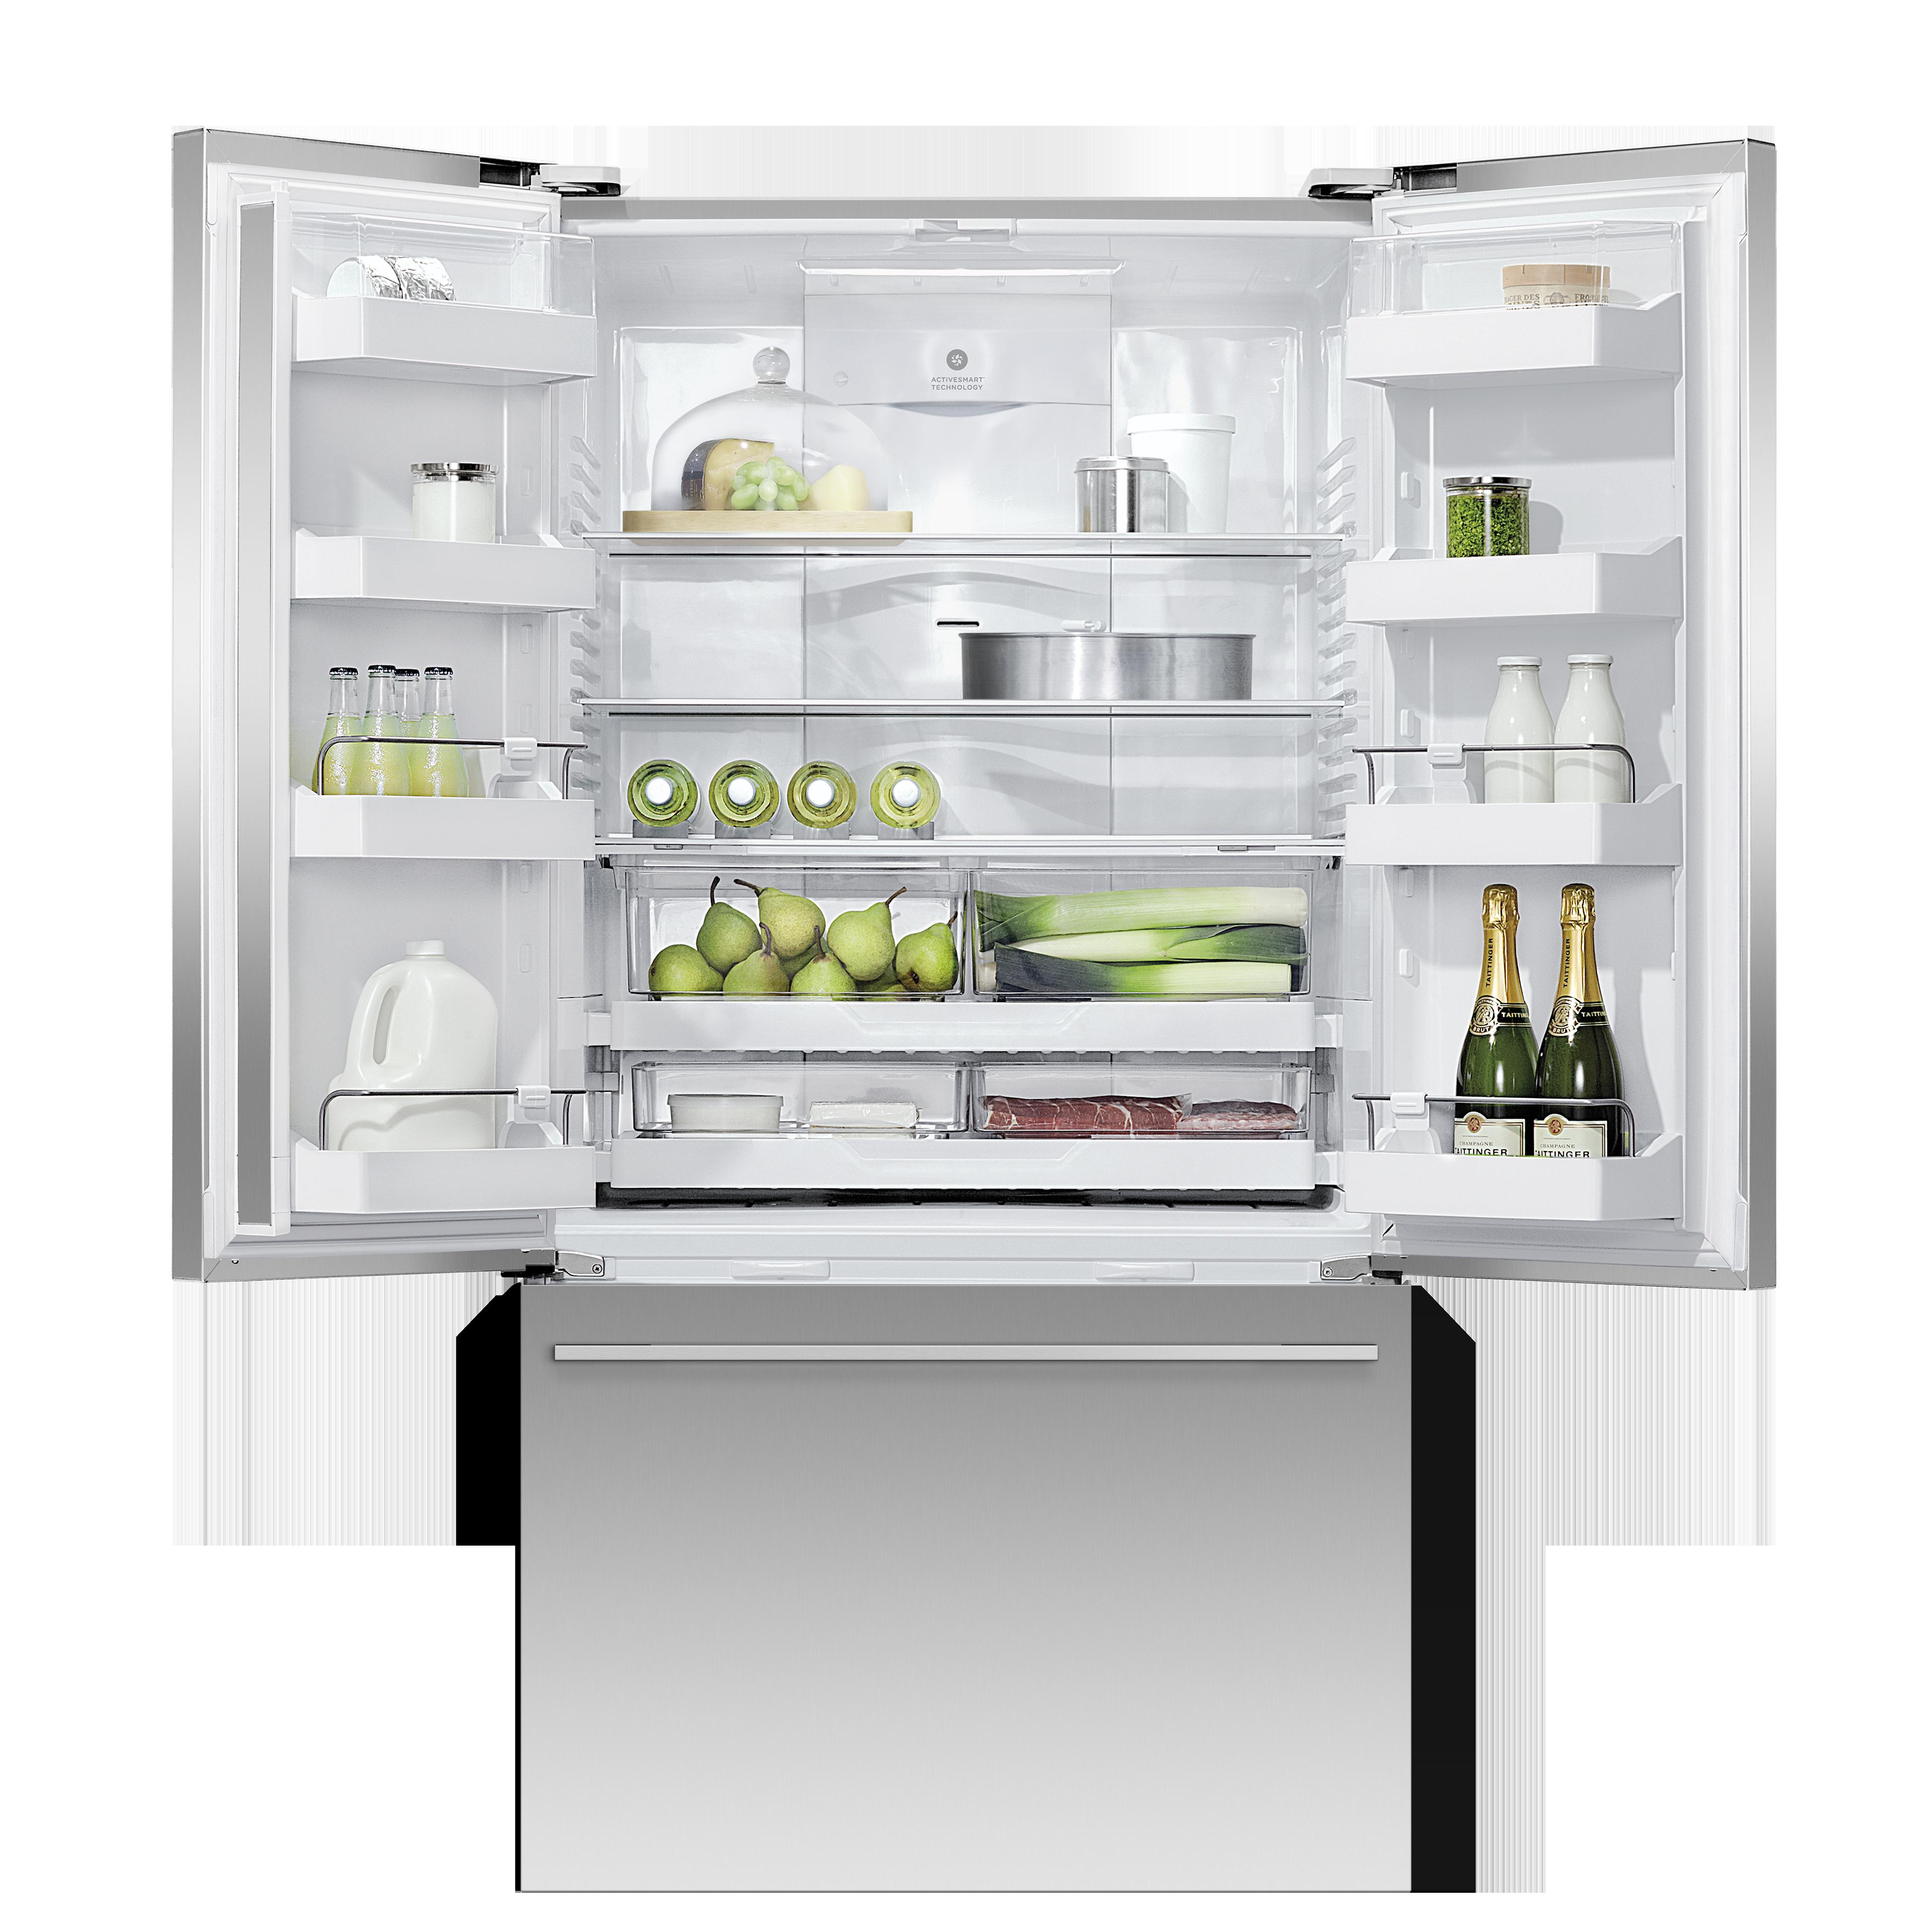 "Fisher and Paykel Freestanding French Door Refrigerator Freezer, 36"", 20.1 cu ft, Ice"